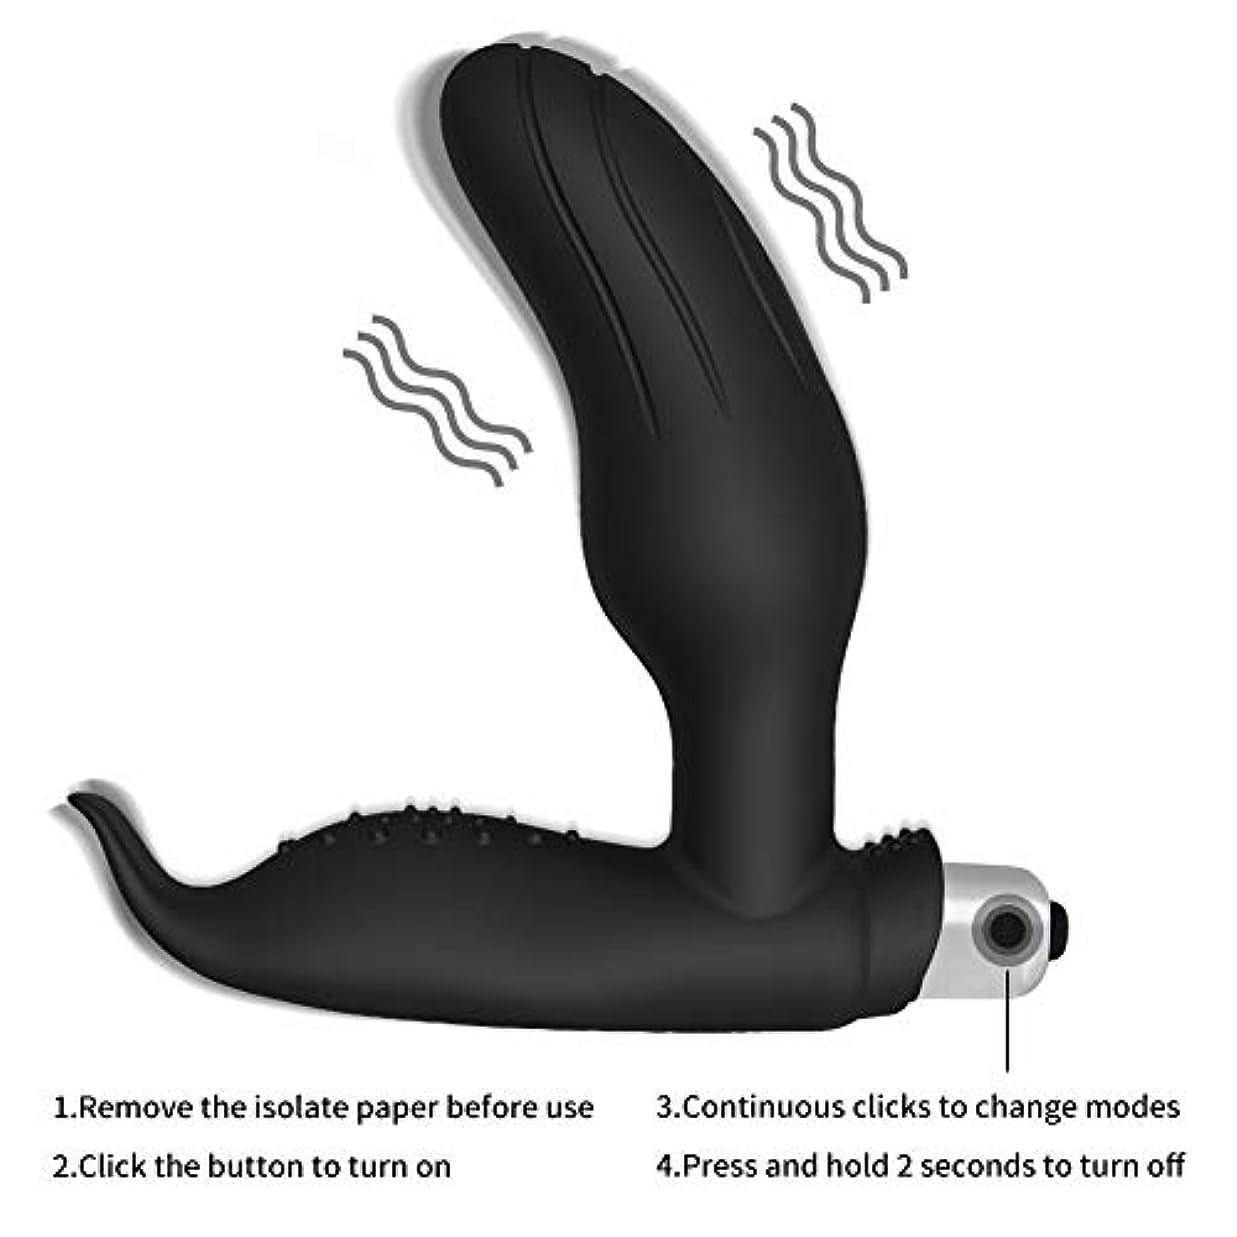 餌メモ余分なNZSZMHS Prostate Massager A-Man Plug用Man G Spot ButtplugVíbrators初心者